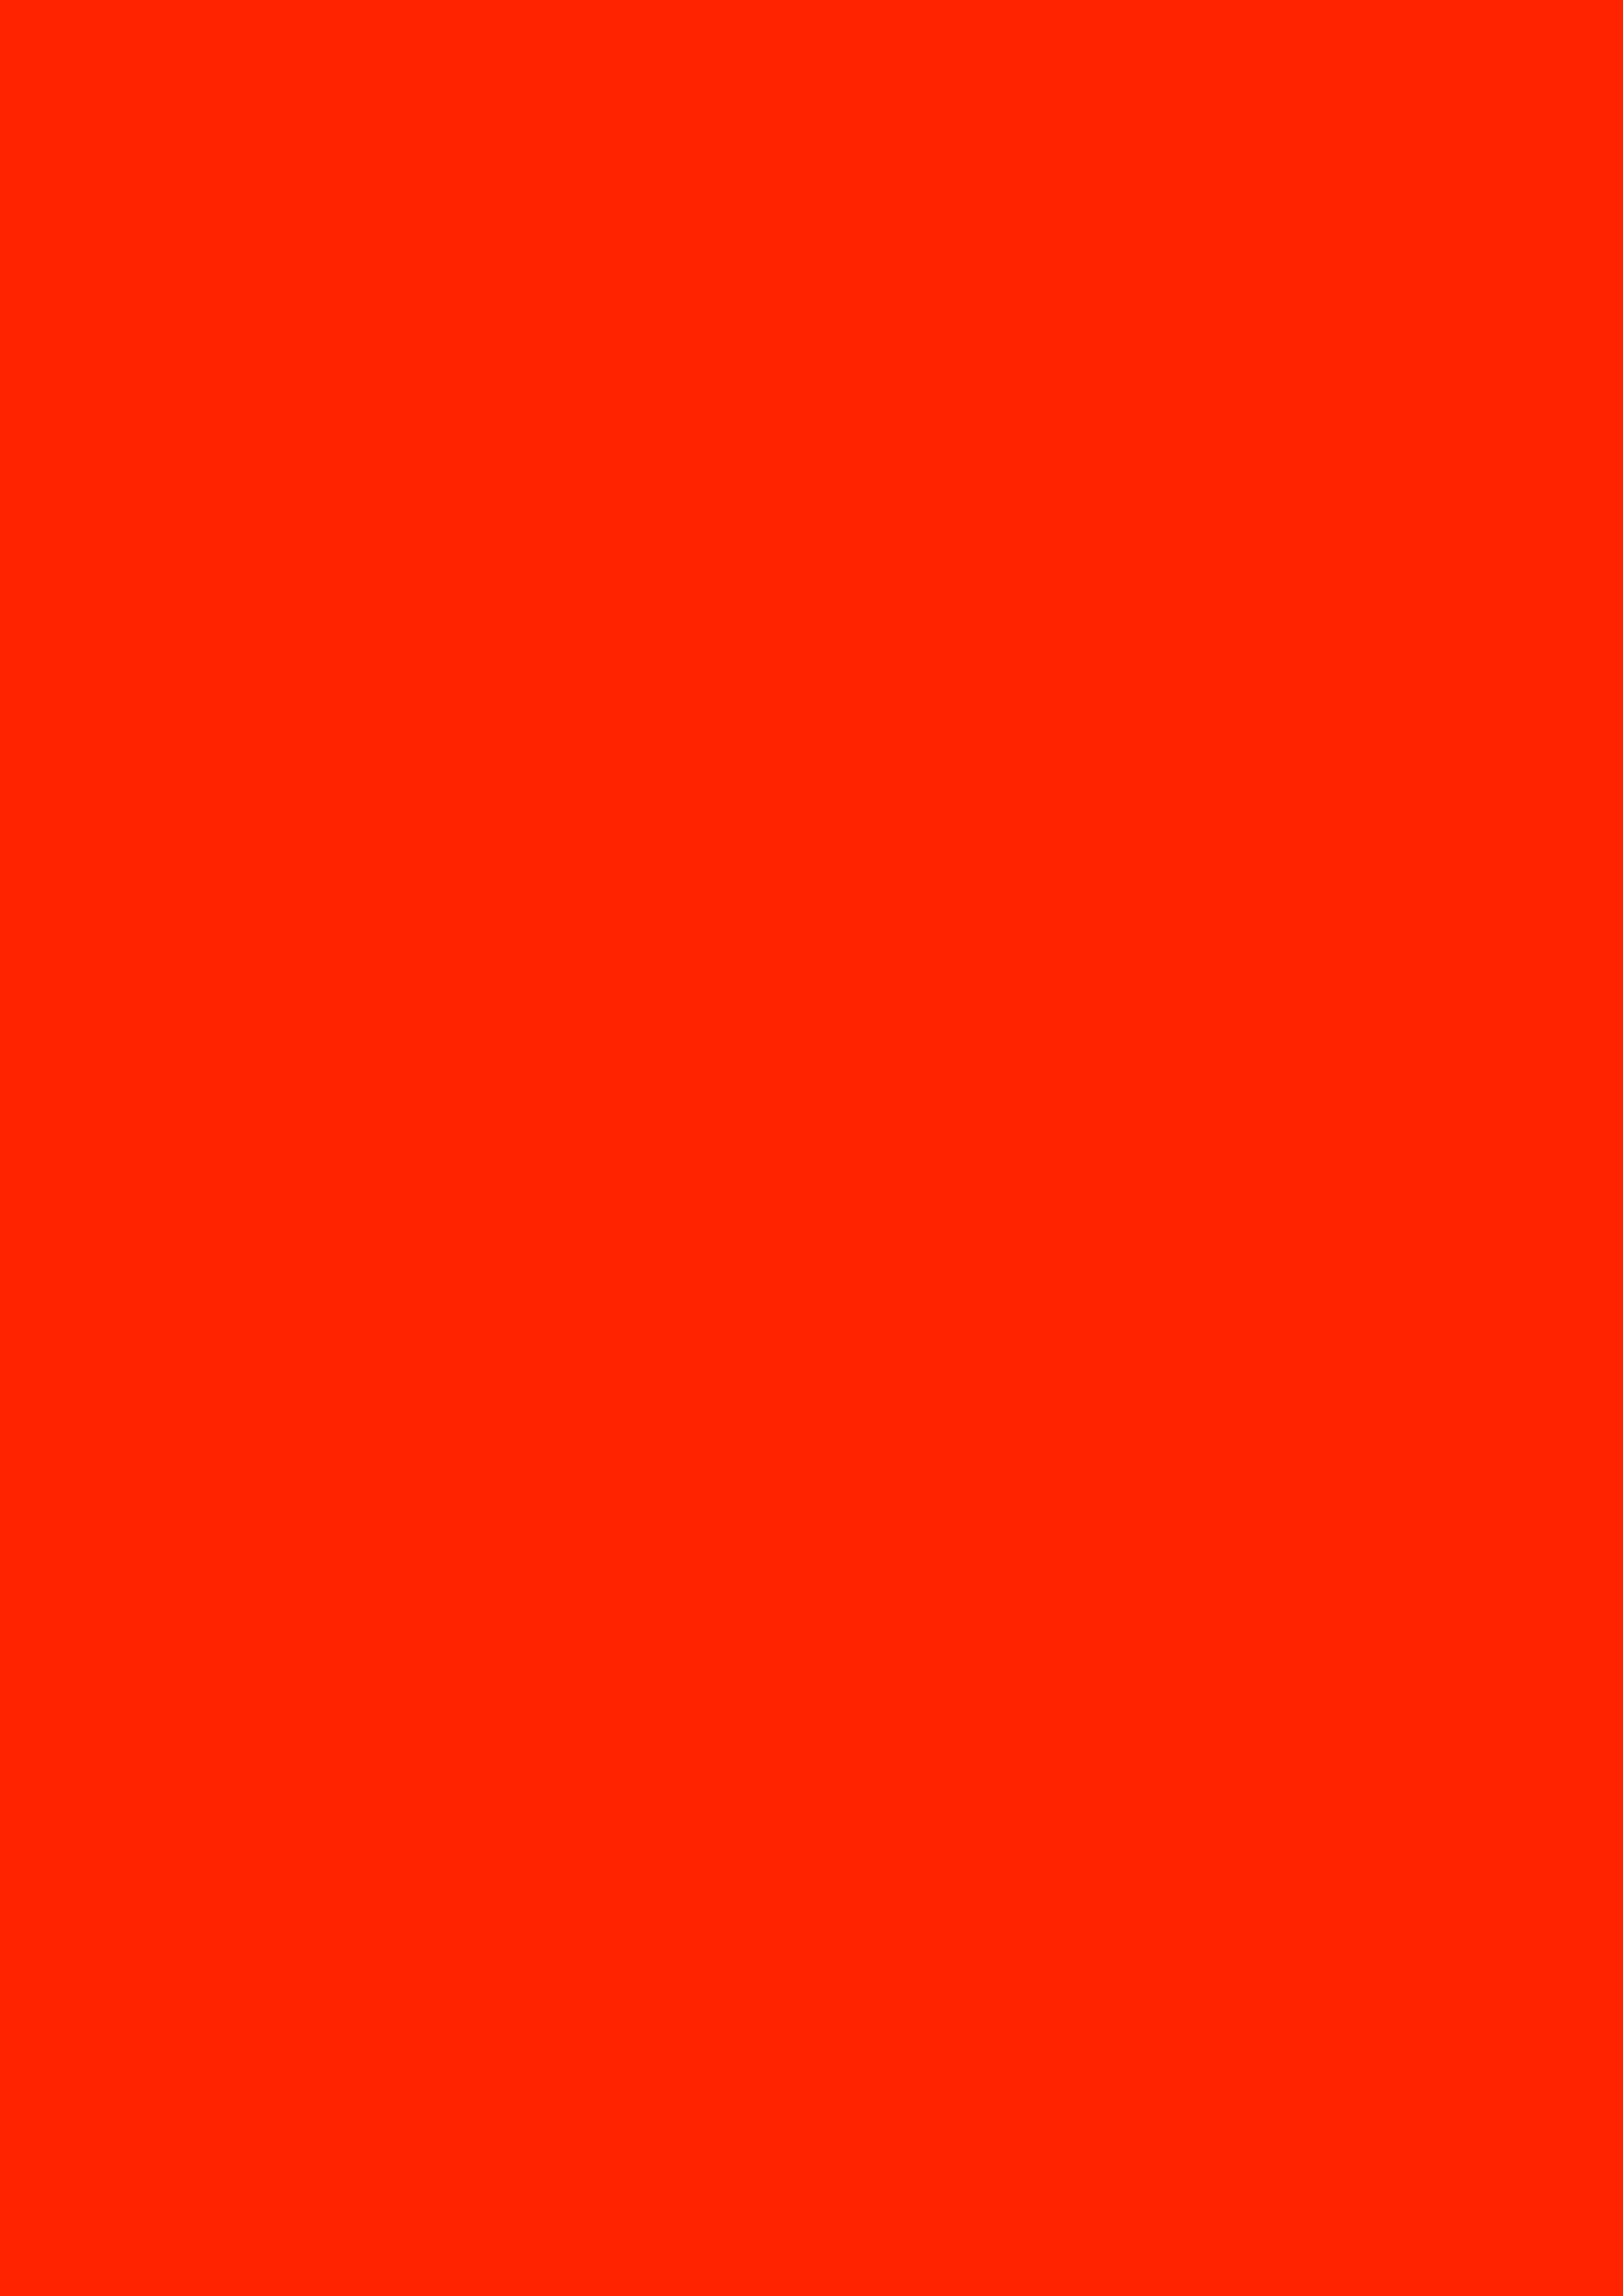 2480x3508 Scarlet Solid Color Background